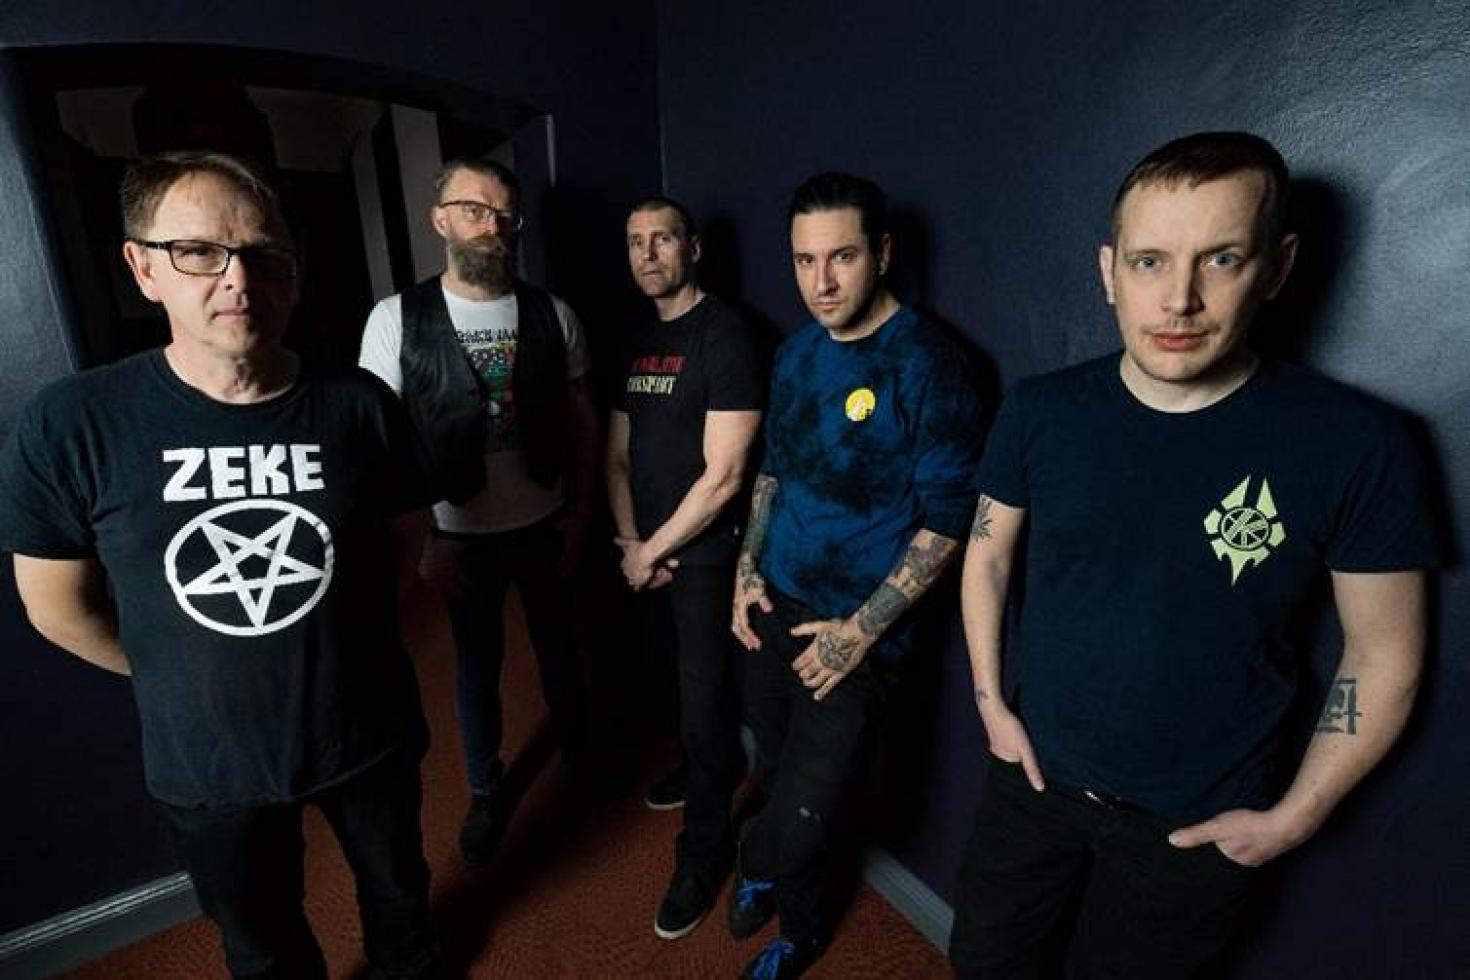 No Fun At All re-release 'Going Steady' EP via SBÄM Records